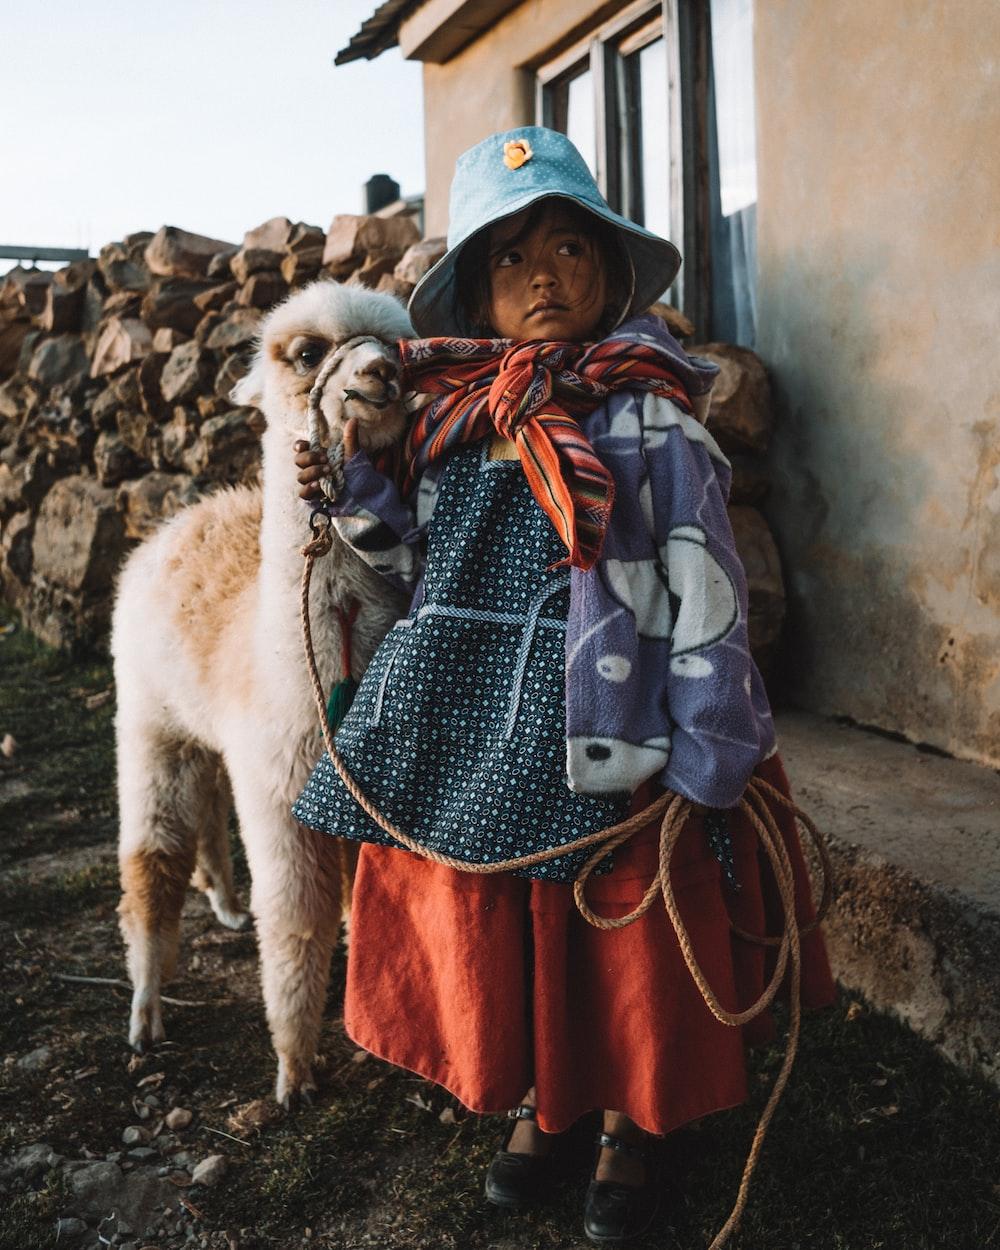 girl wearing multicolored dress standing near white llama